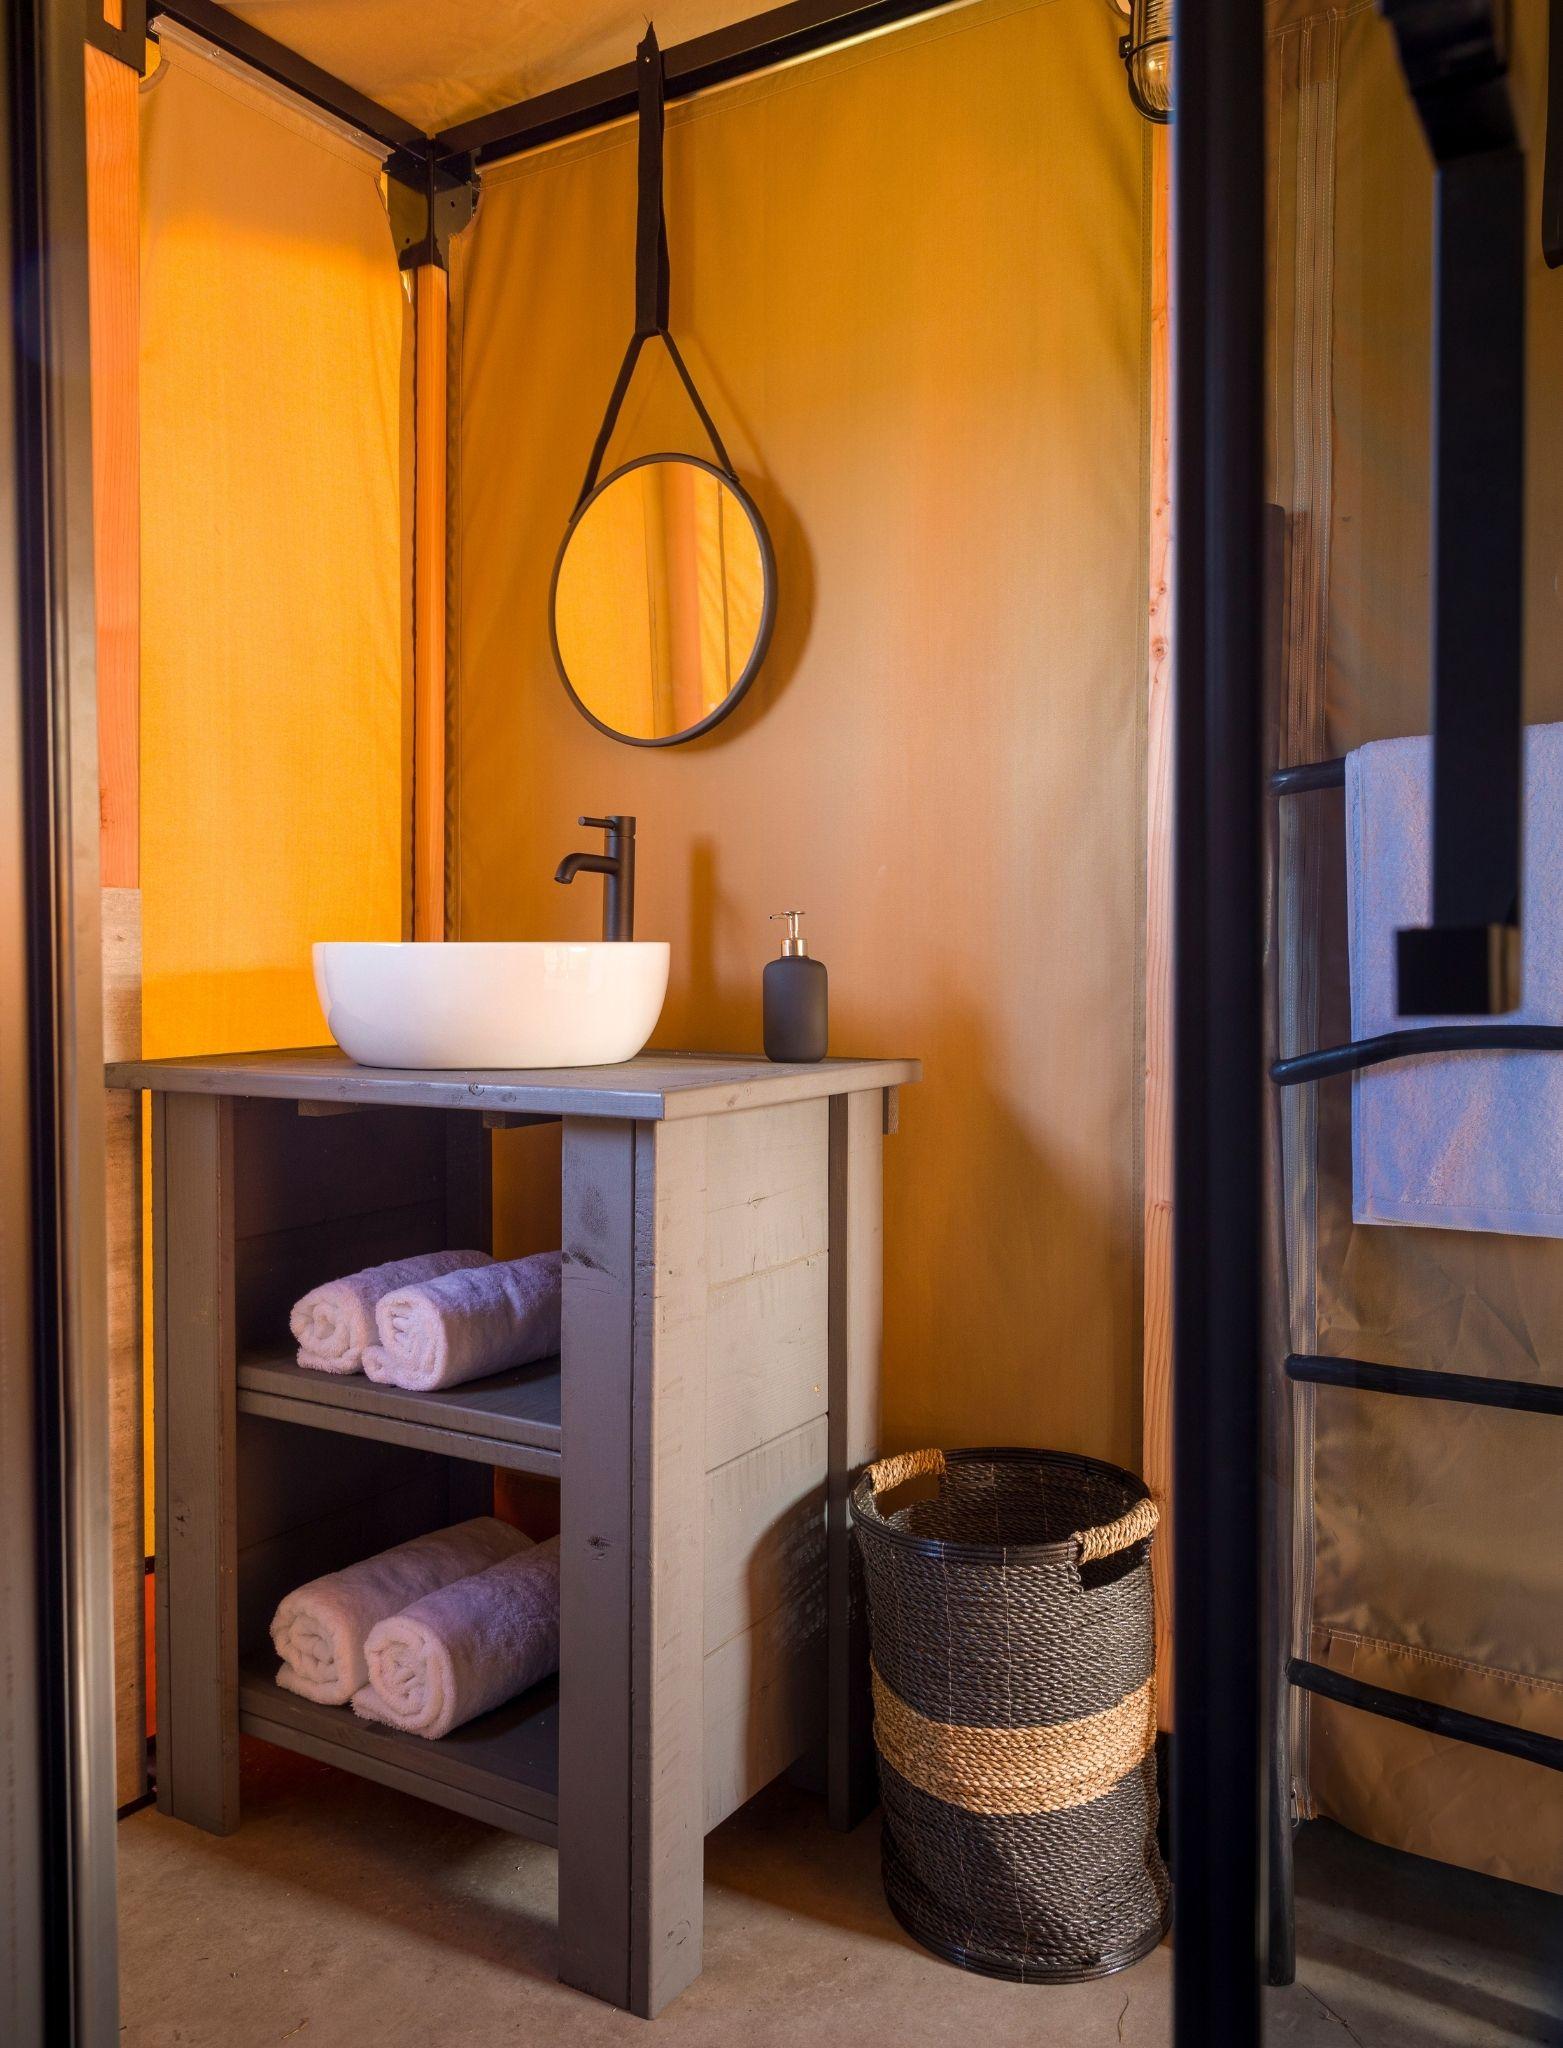 YALA_Bathroom_interior_Pure